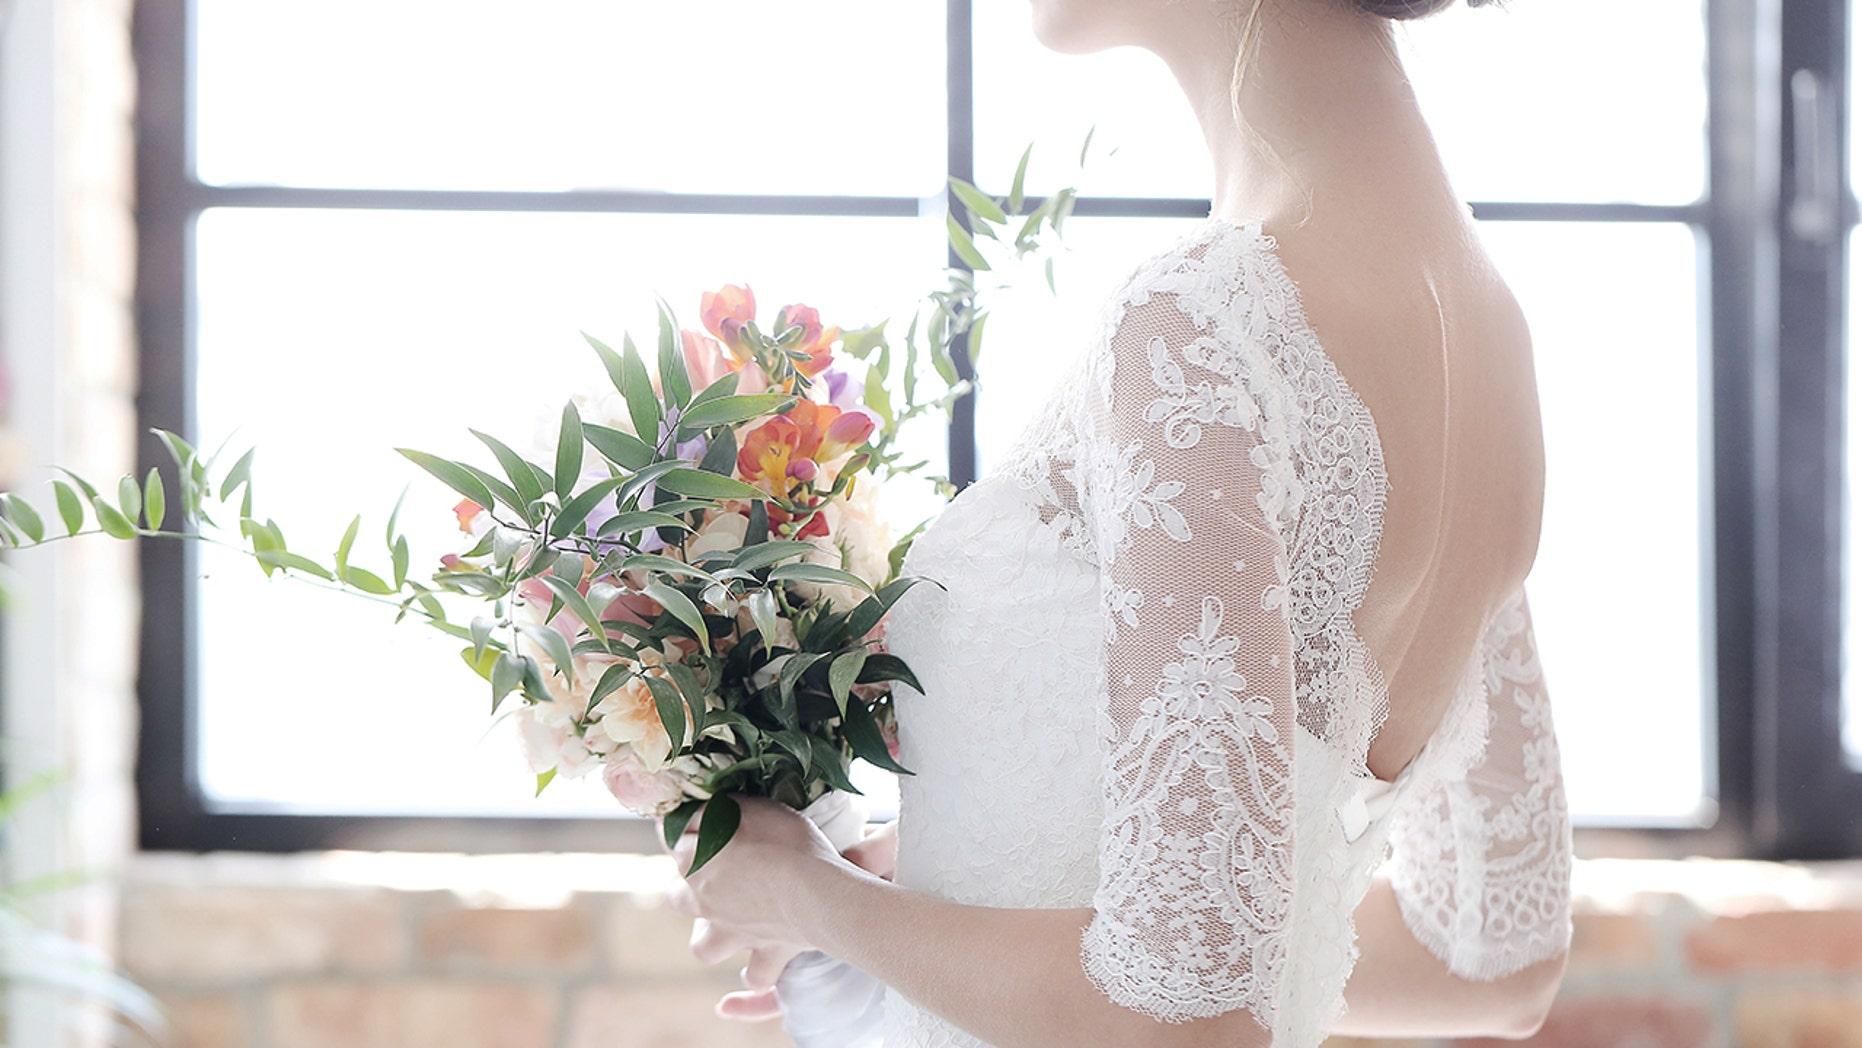 A bride surprised her grandmother by wearing her vintage wedding dress